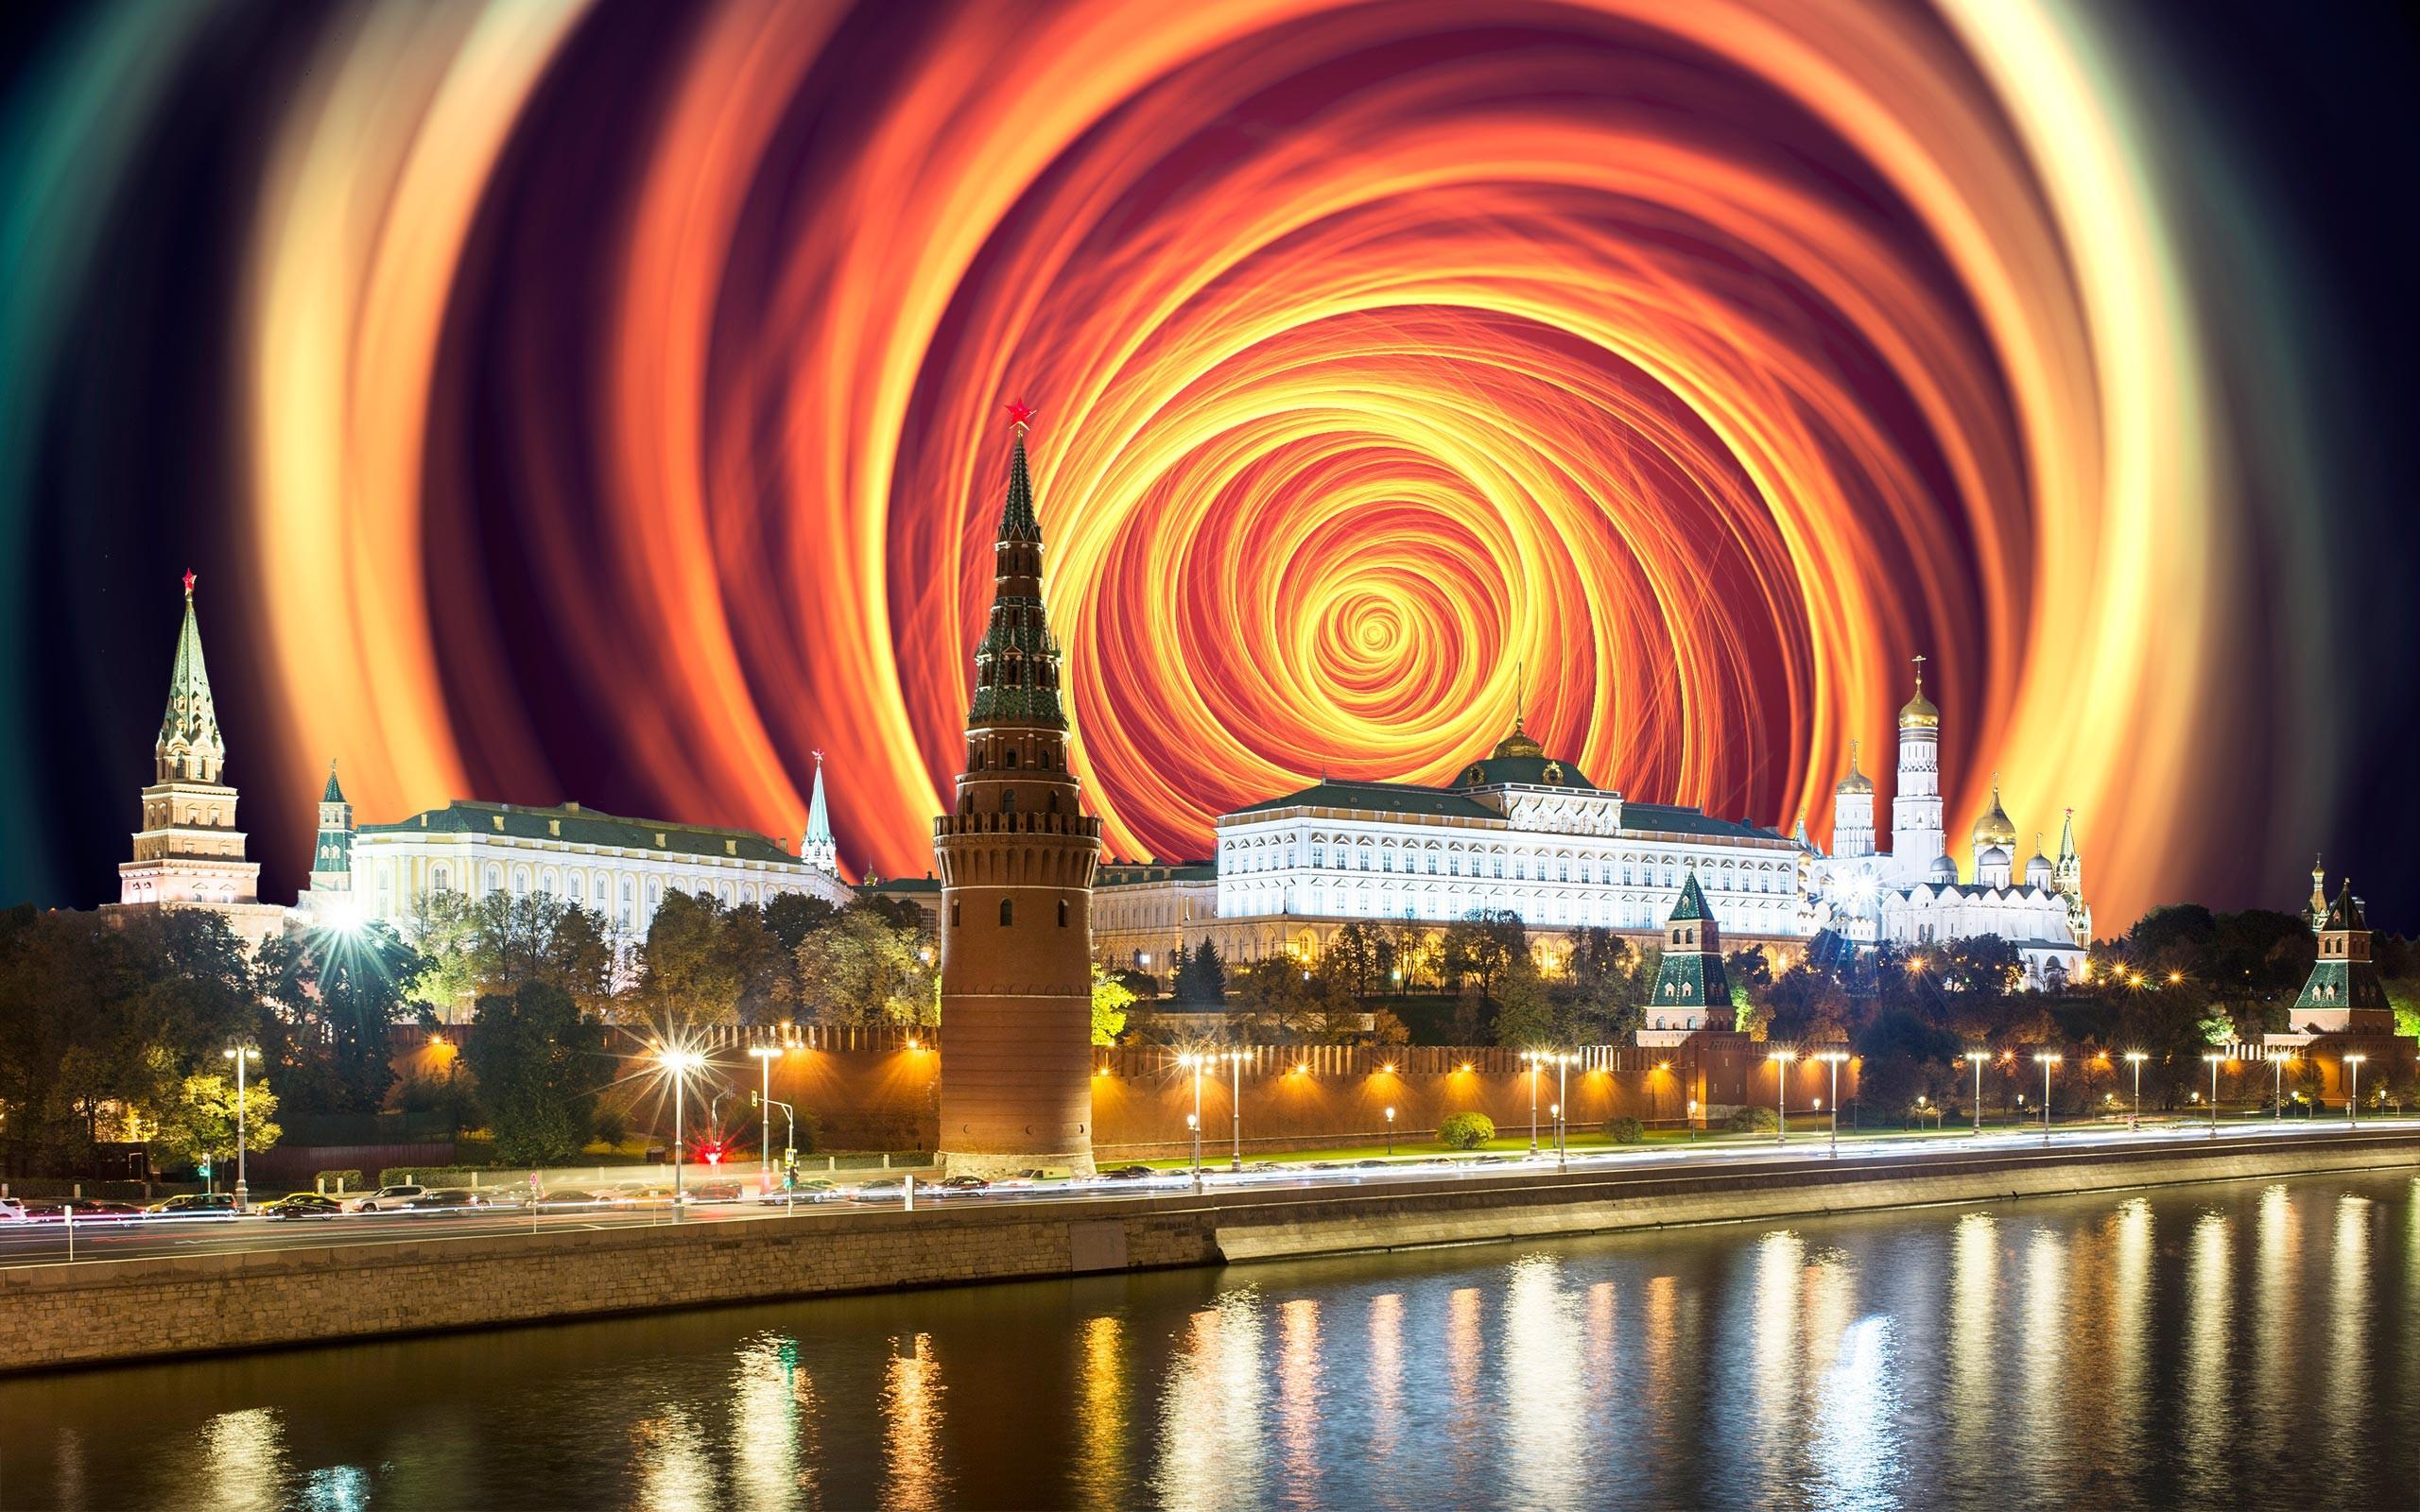 "<p>Коллаж &copy; L!FE. Фото: &copy; РИА Новости/Евгений Биятов, &copy; <a href=""https://www.flickr.com/photos/130197050@N04/16066125166/in/photostream/"" target=""_blank"">Flickr/Nullfy from nullfy.com!</a></p>"